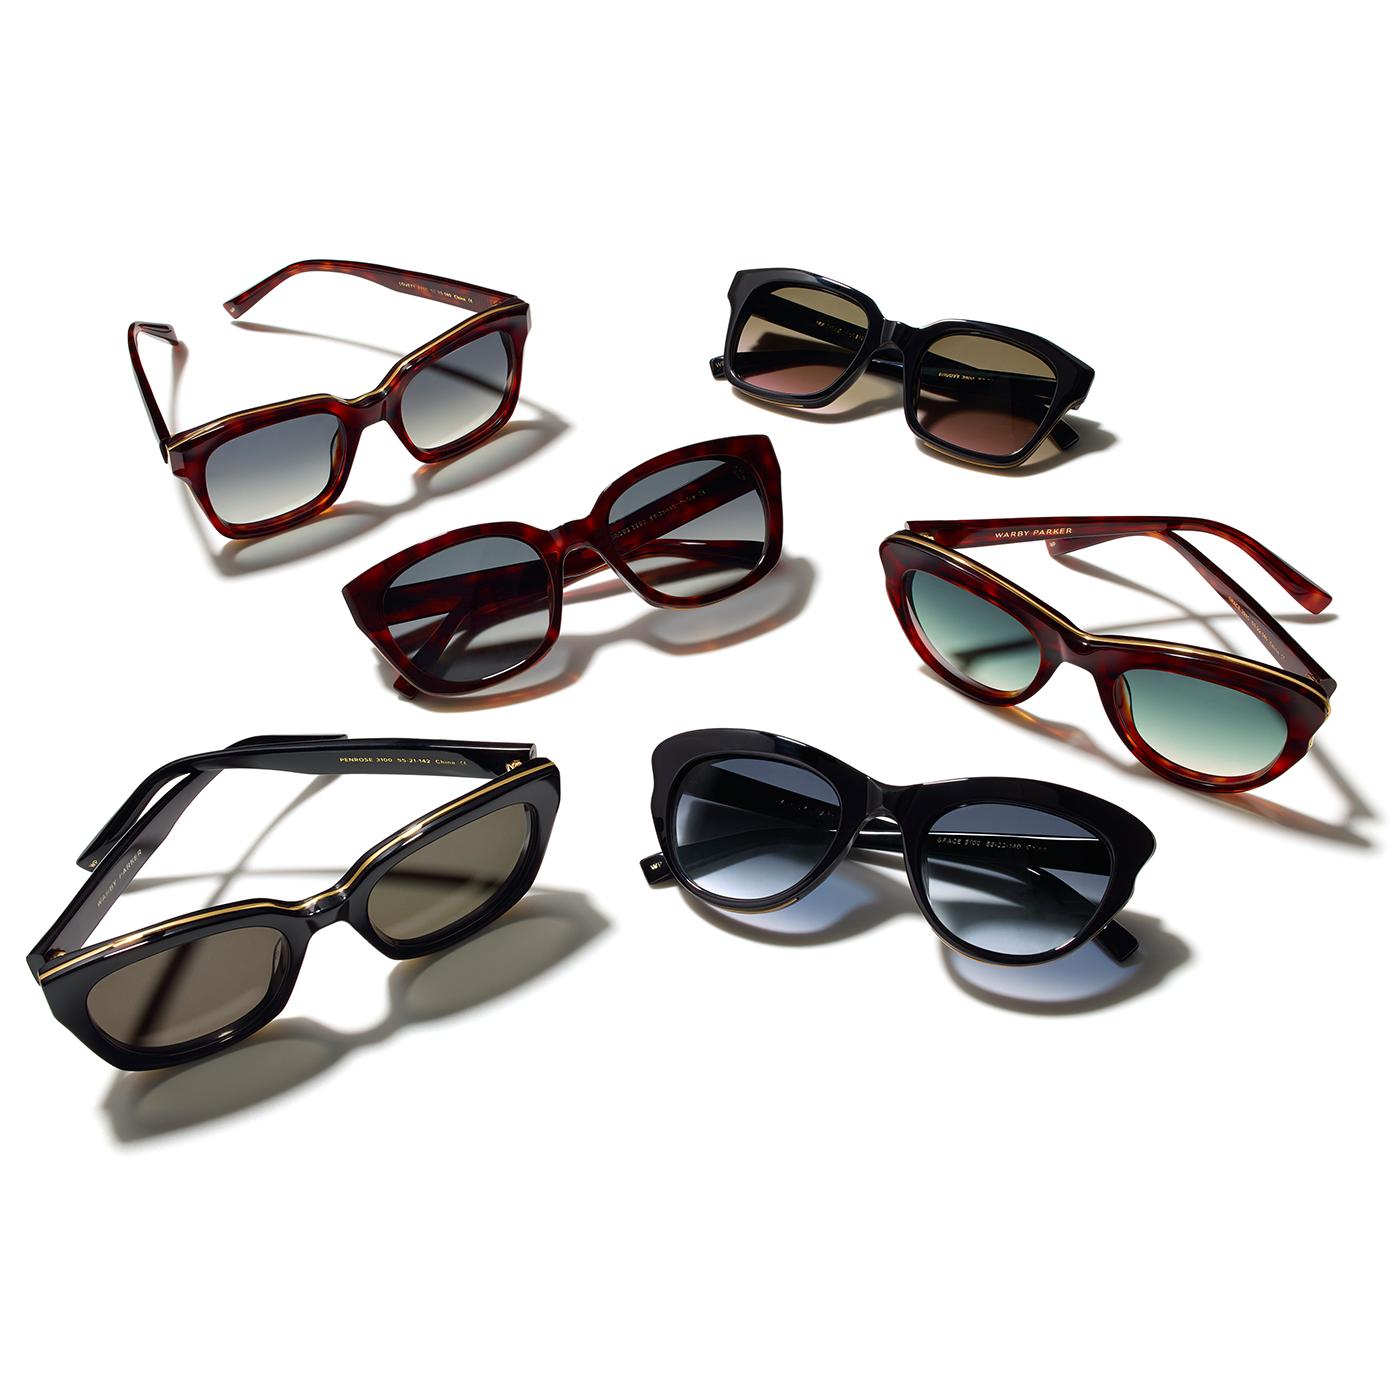 a1eec2f9e3d Thea Collection Sunglasses — Eyewear Blogger